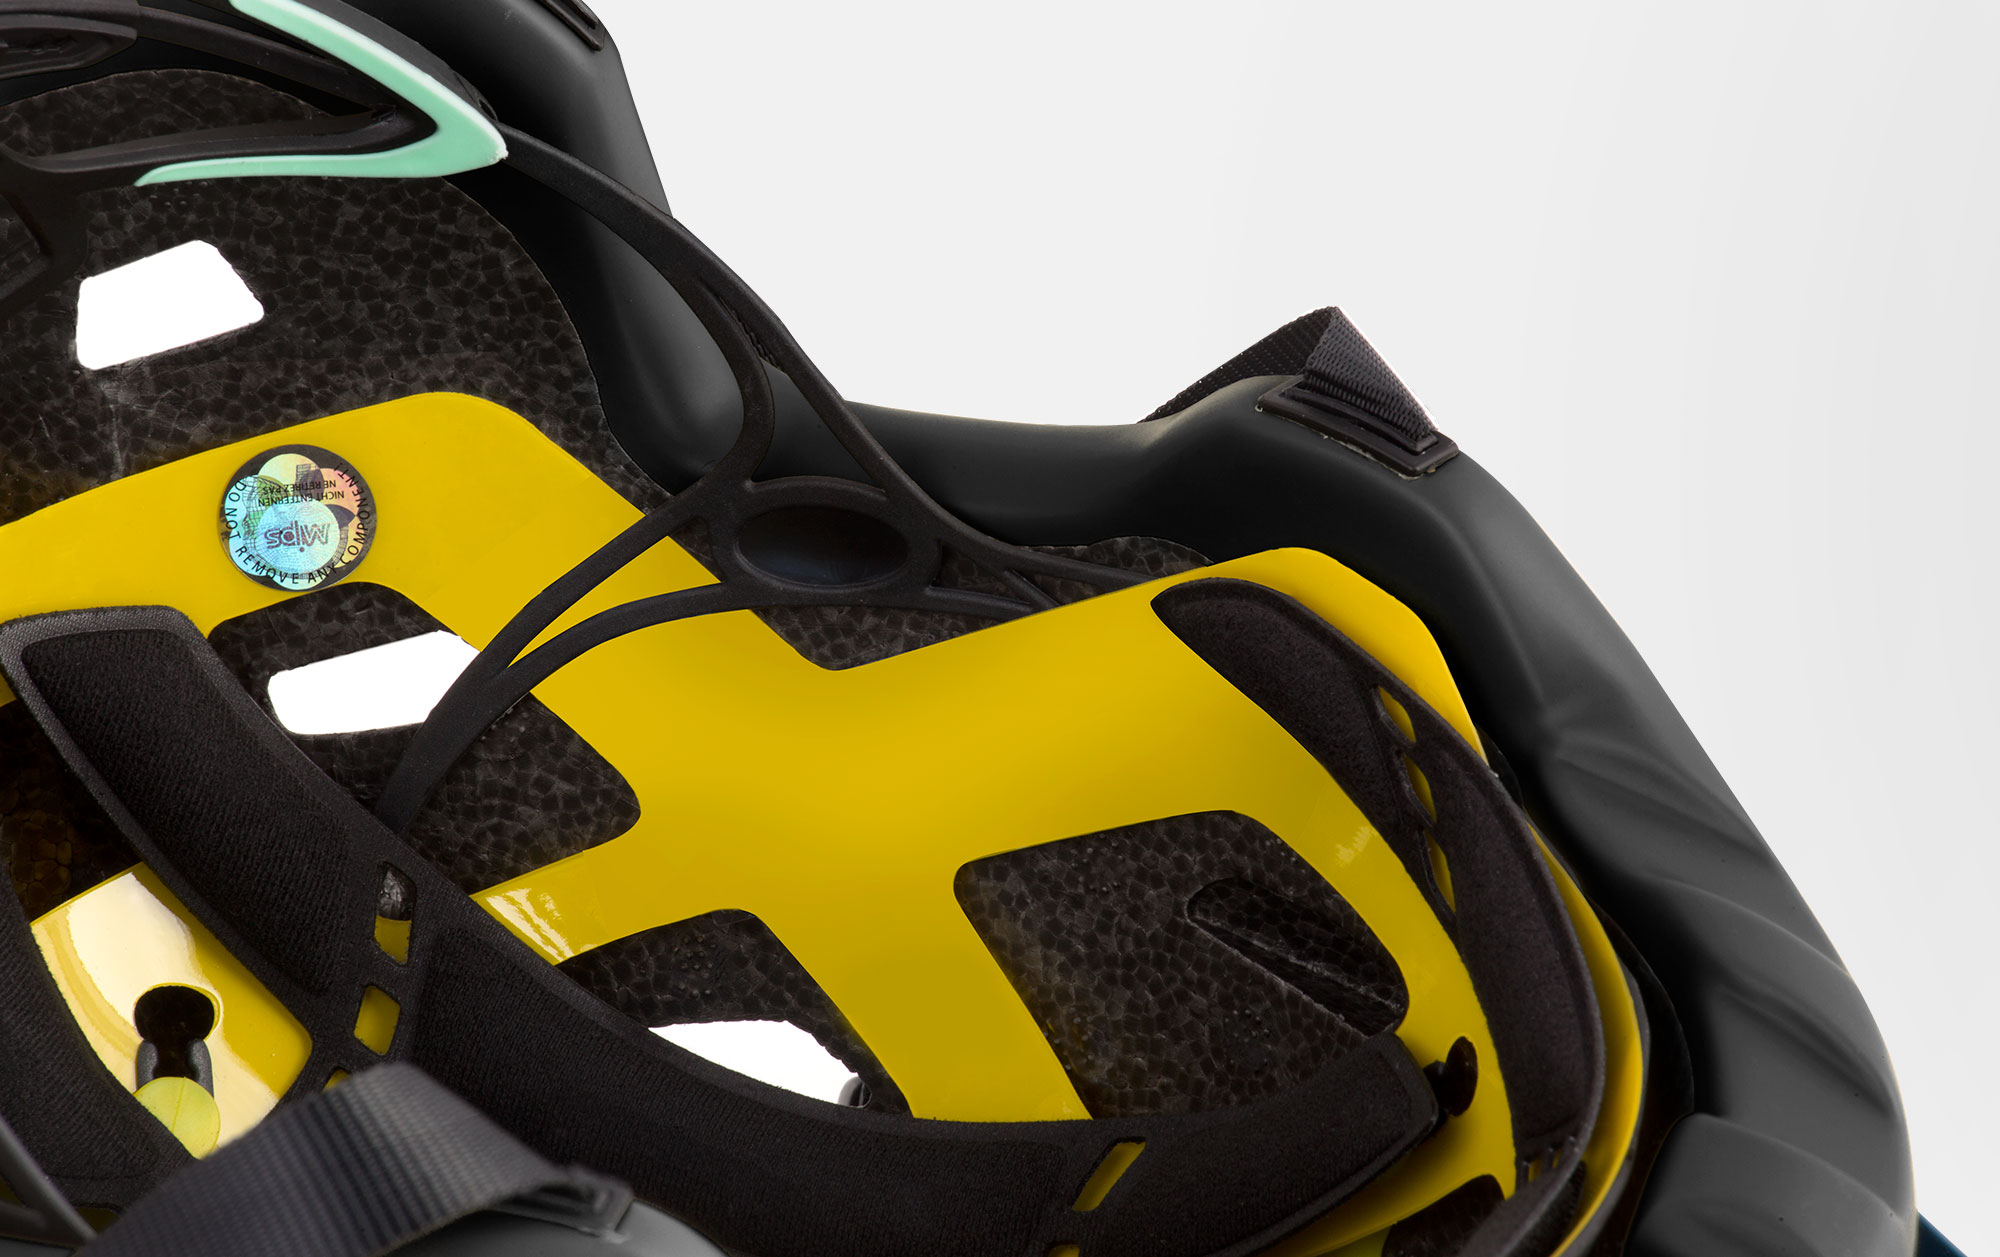 MET Roam Mips Enduro, Trail and E-MTB Helmet Brain Protection System